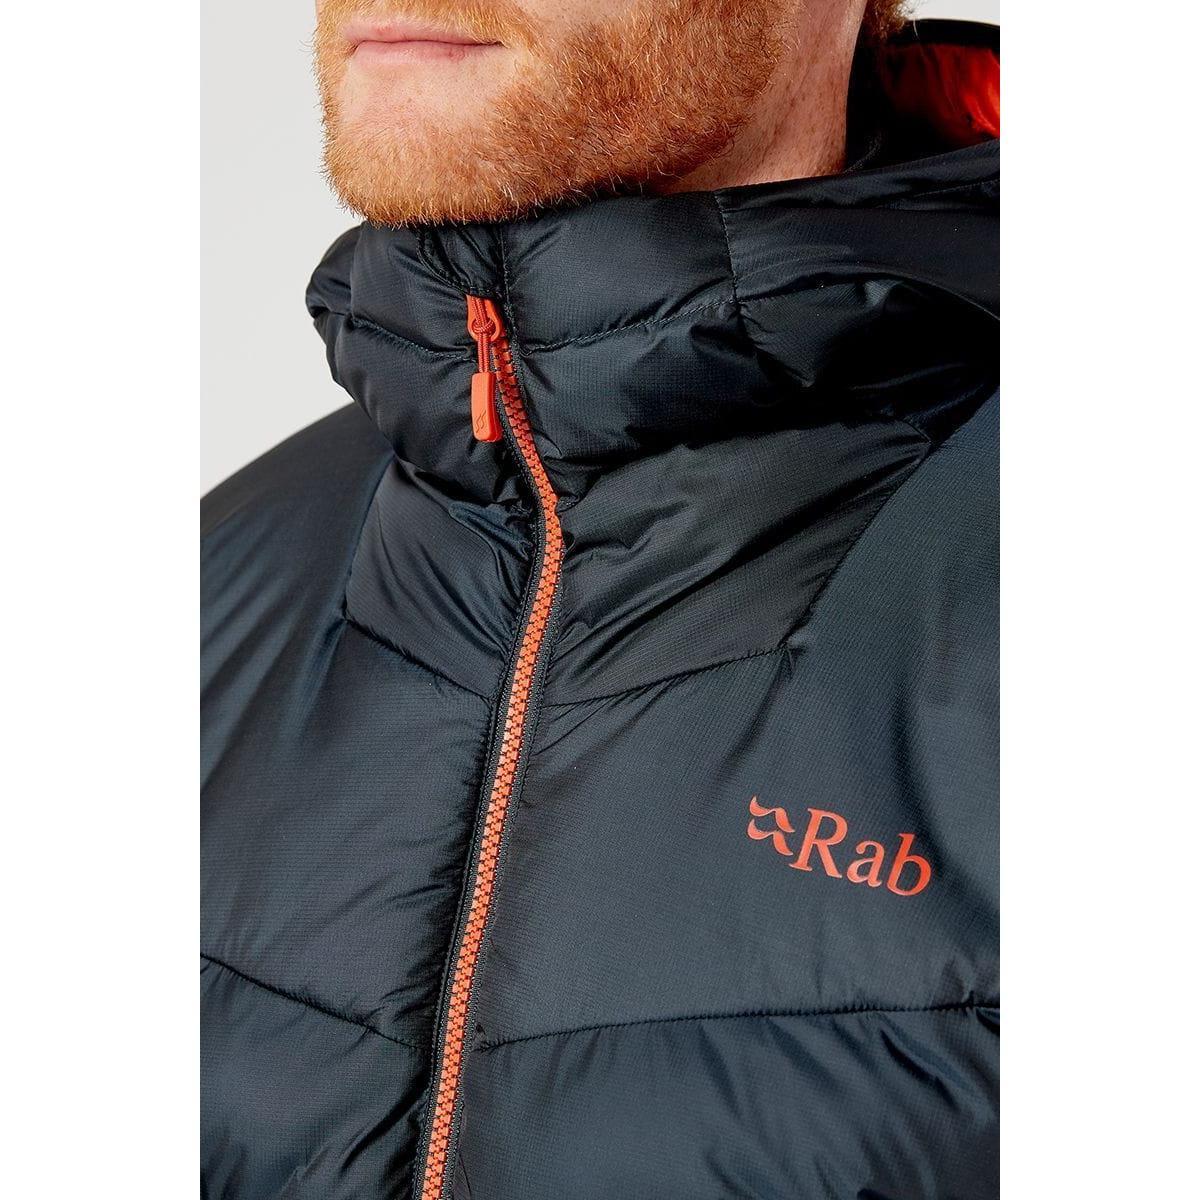 Rab Men's Rab Nebula Pro Jacket - Grey